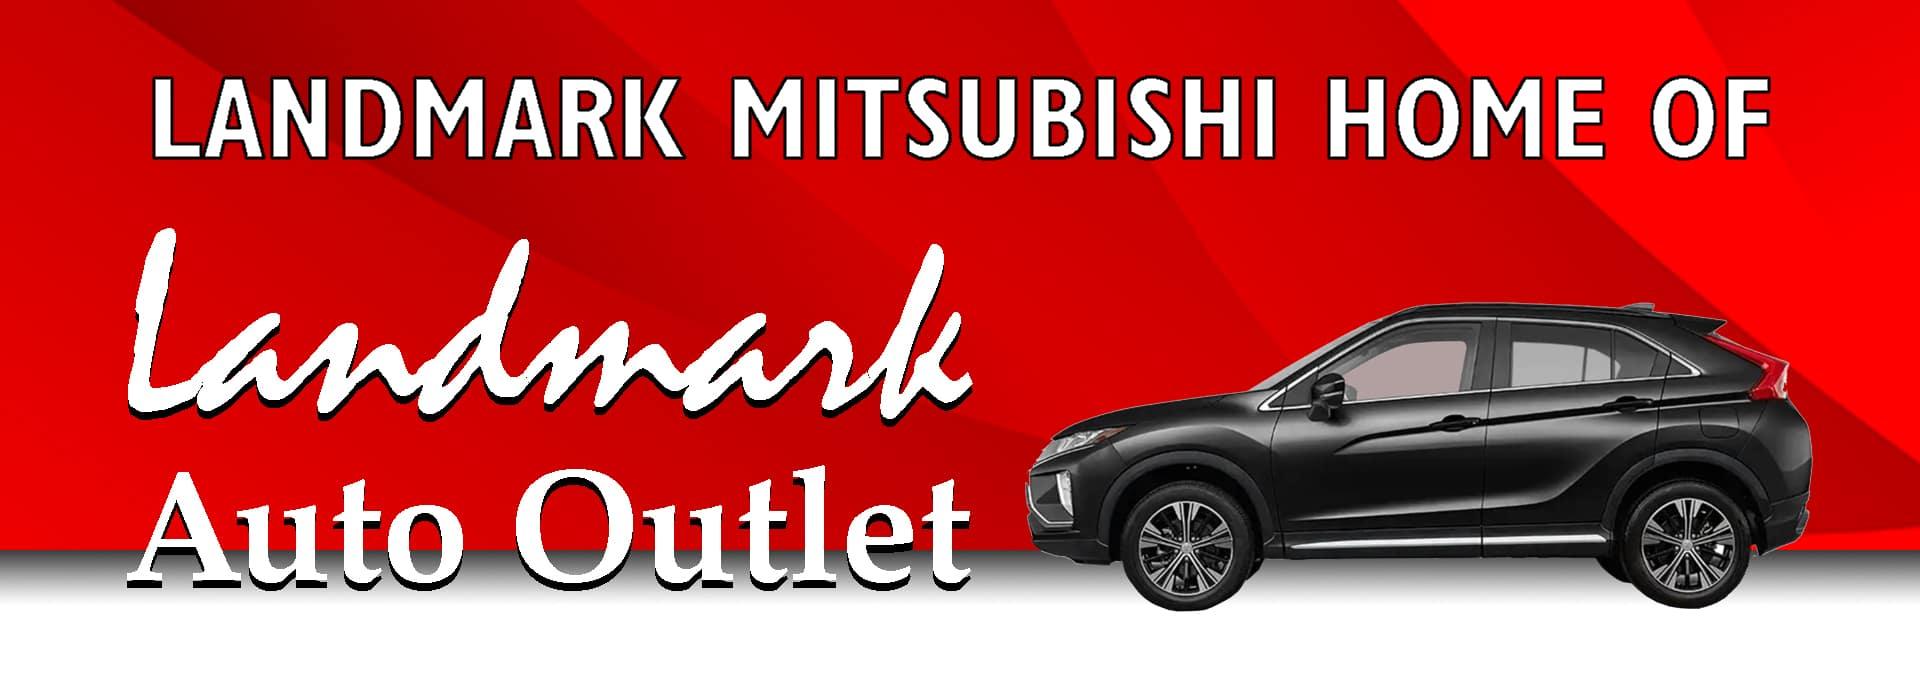 Landmark Mitsubish Ad